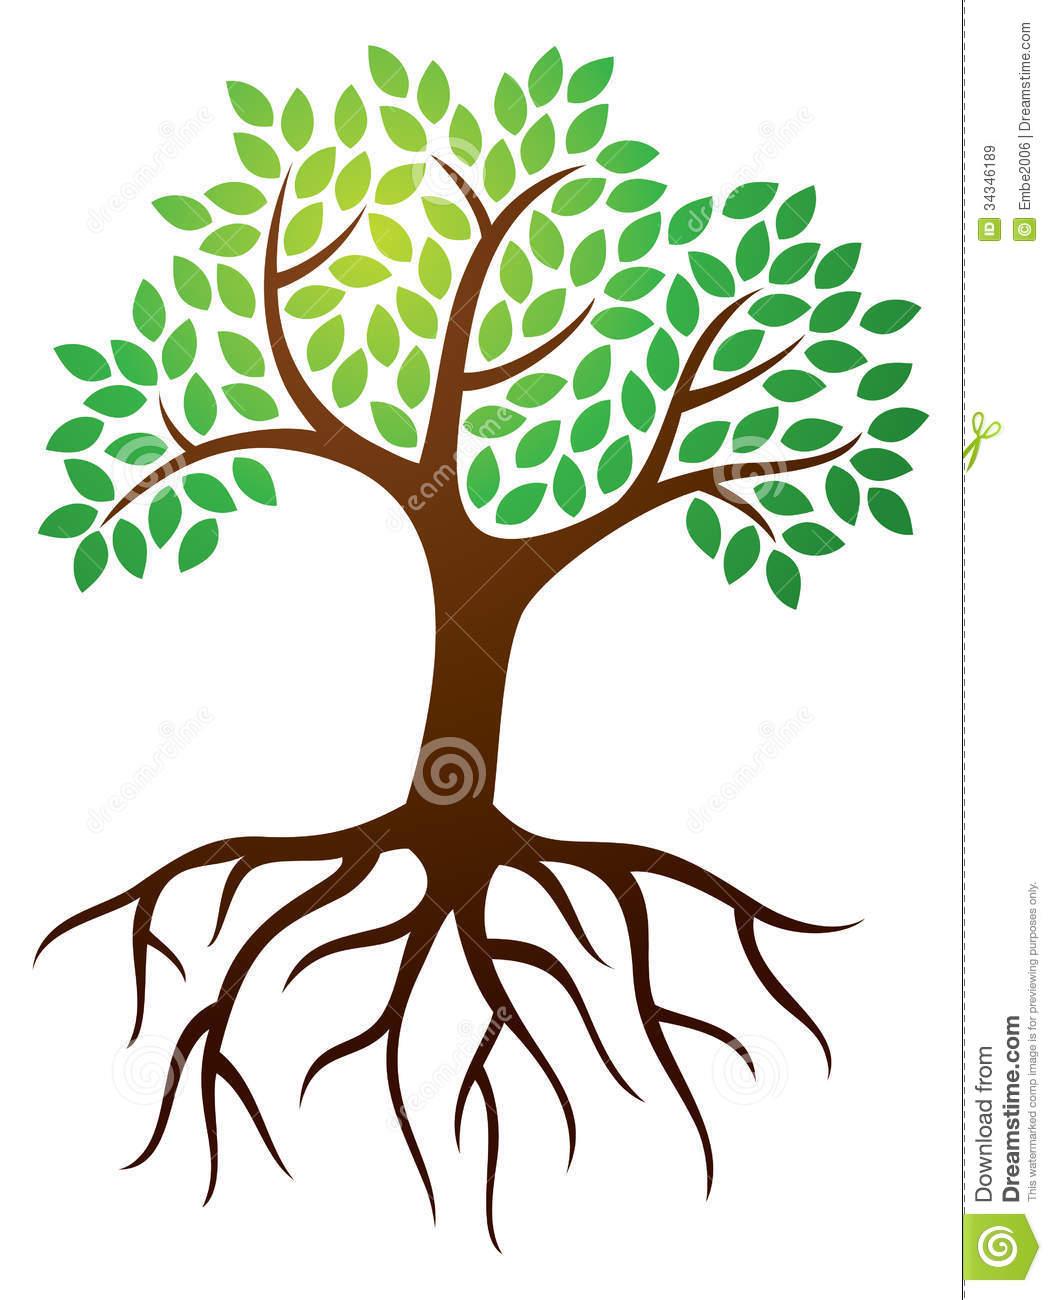 Trees With Roots Clipart-Trees With Roots Clipart-17